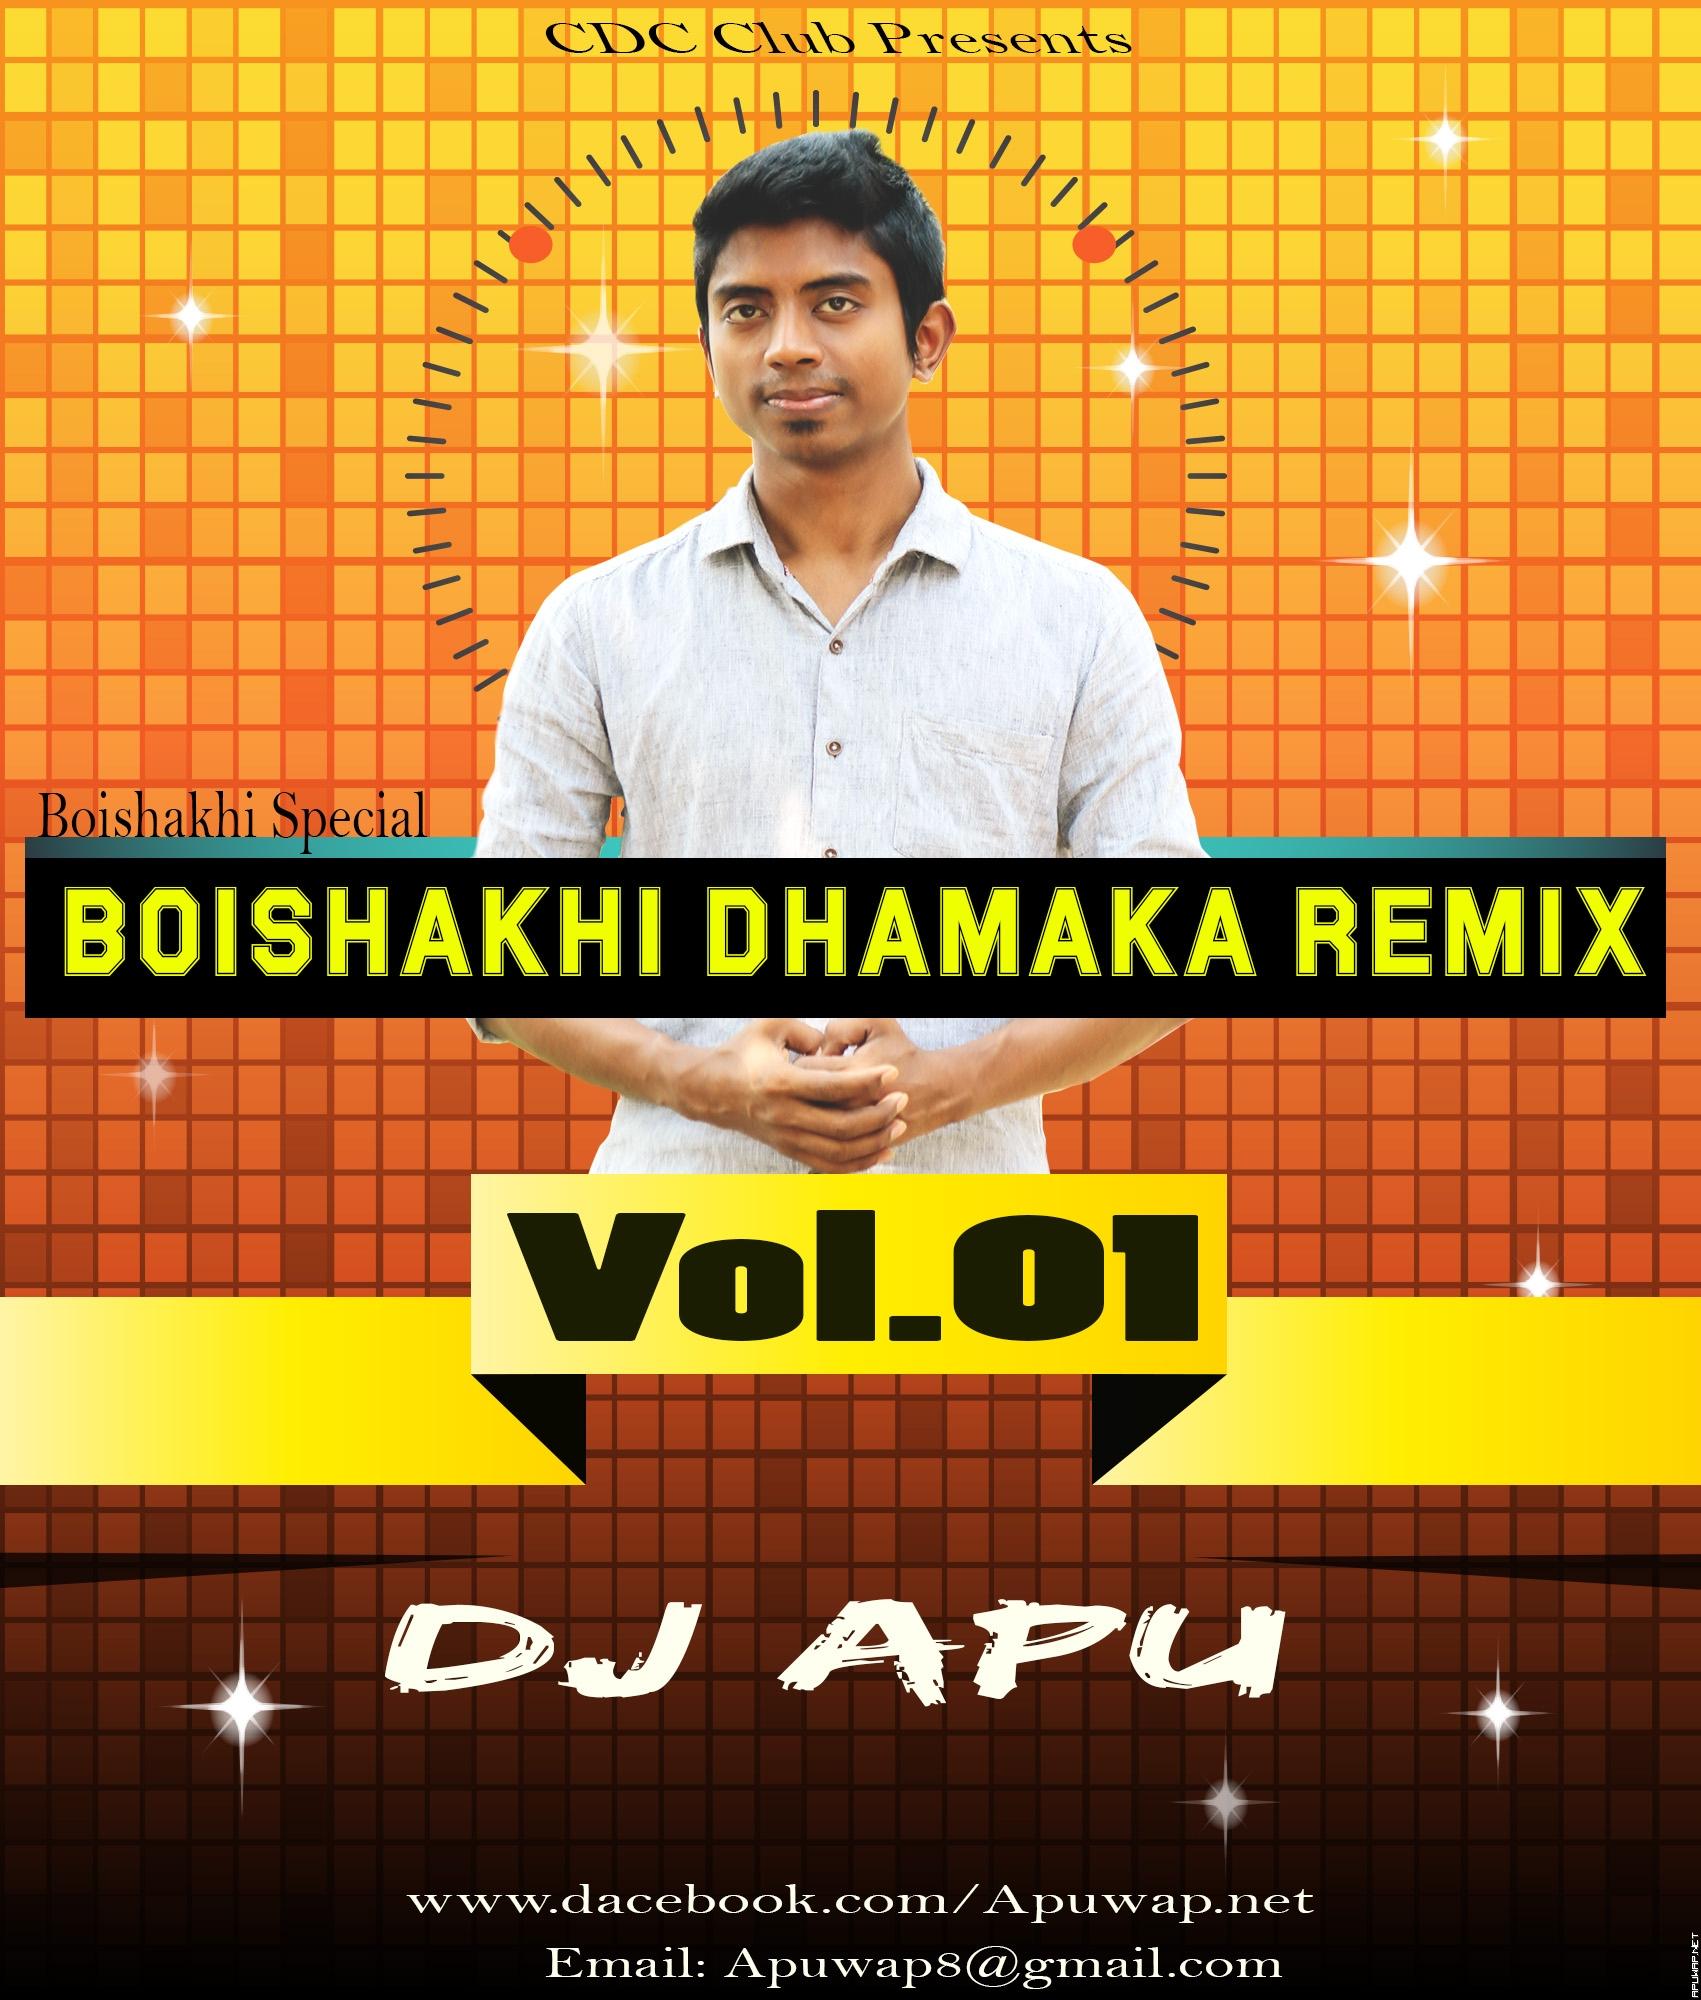 Elo Re Boishakh - Kazi Shuvo - 2018 Hot Dance - Dj Apu.mp3